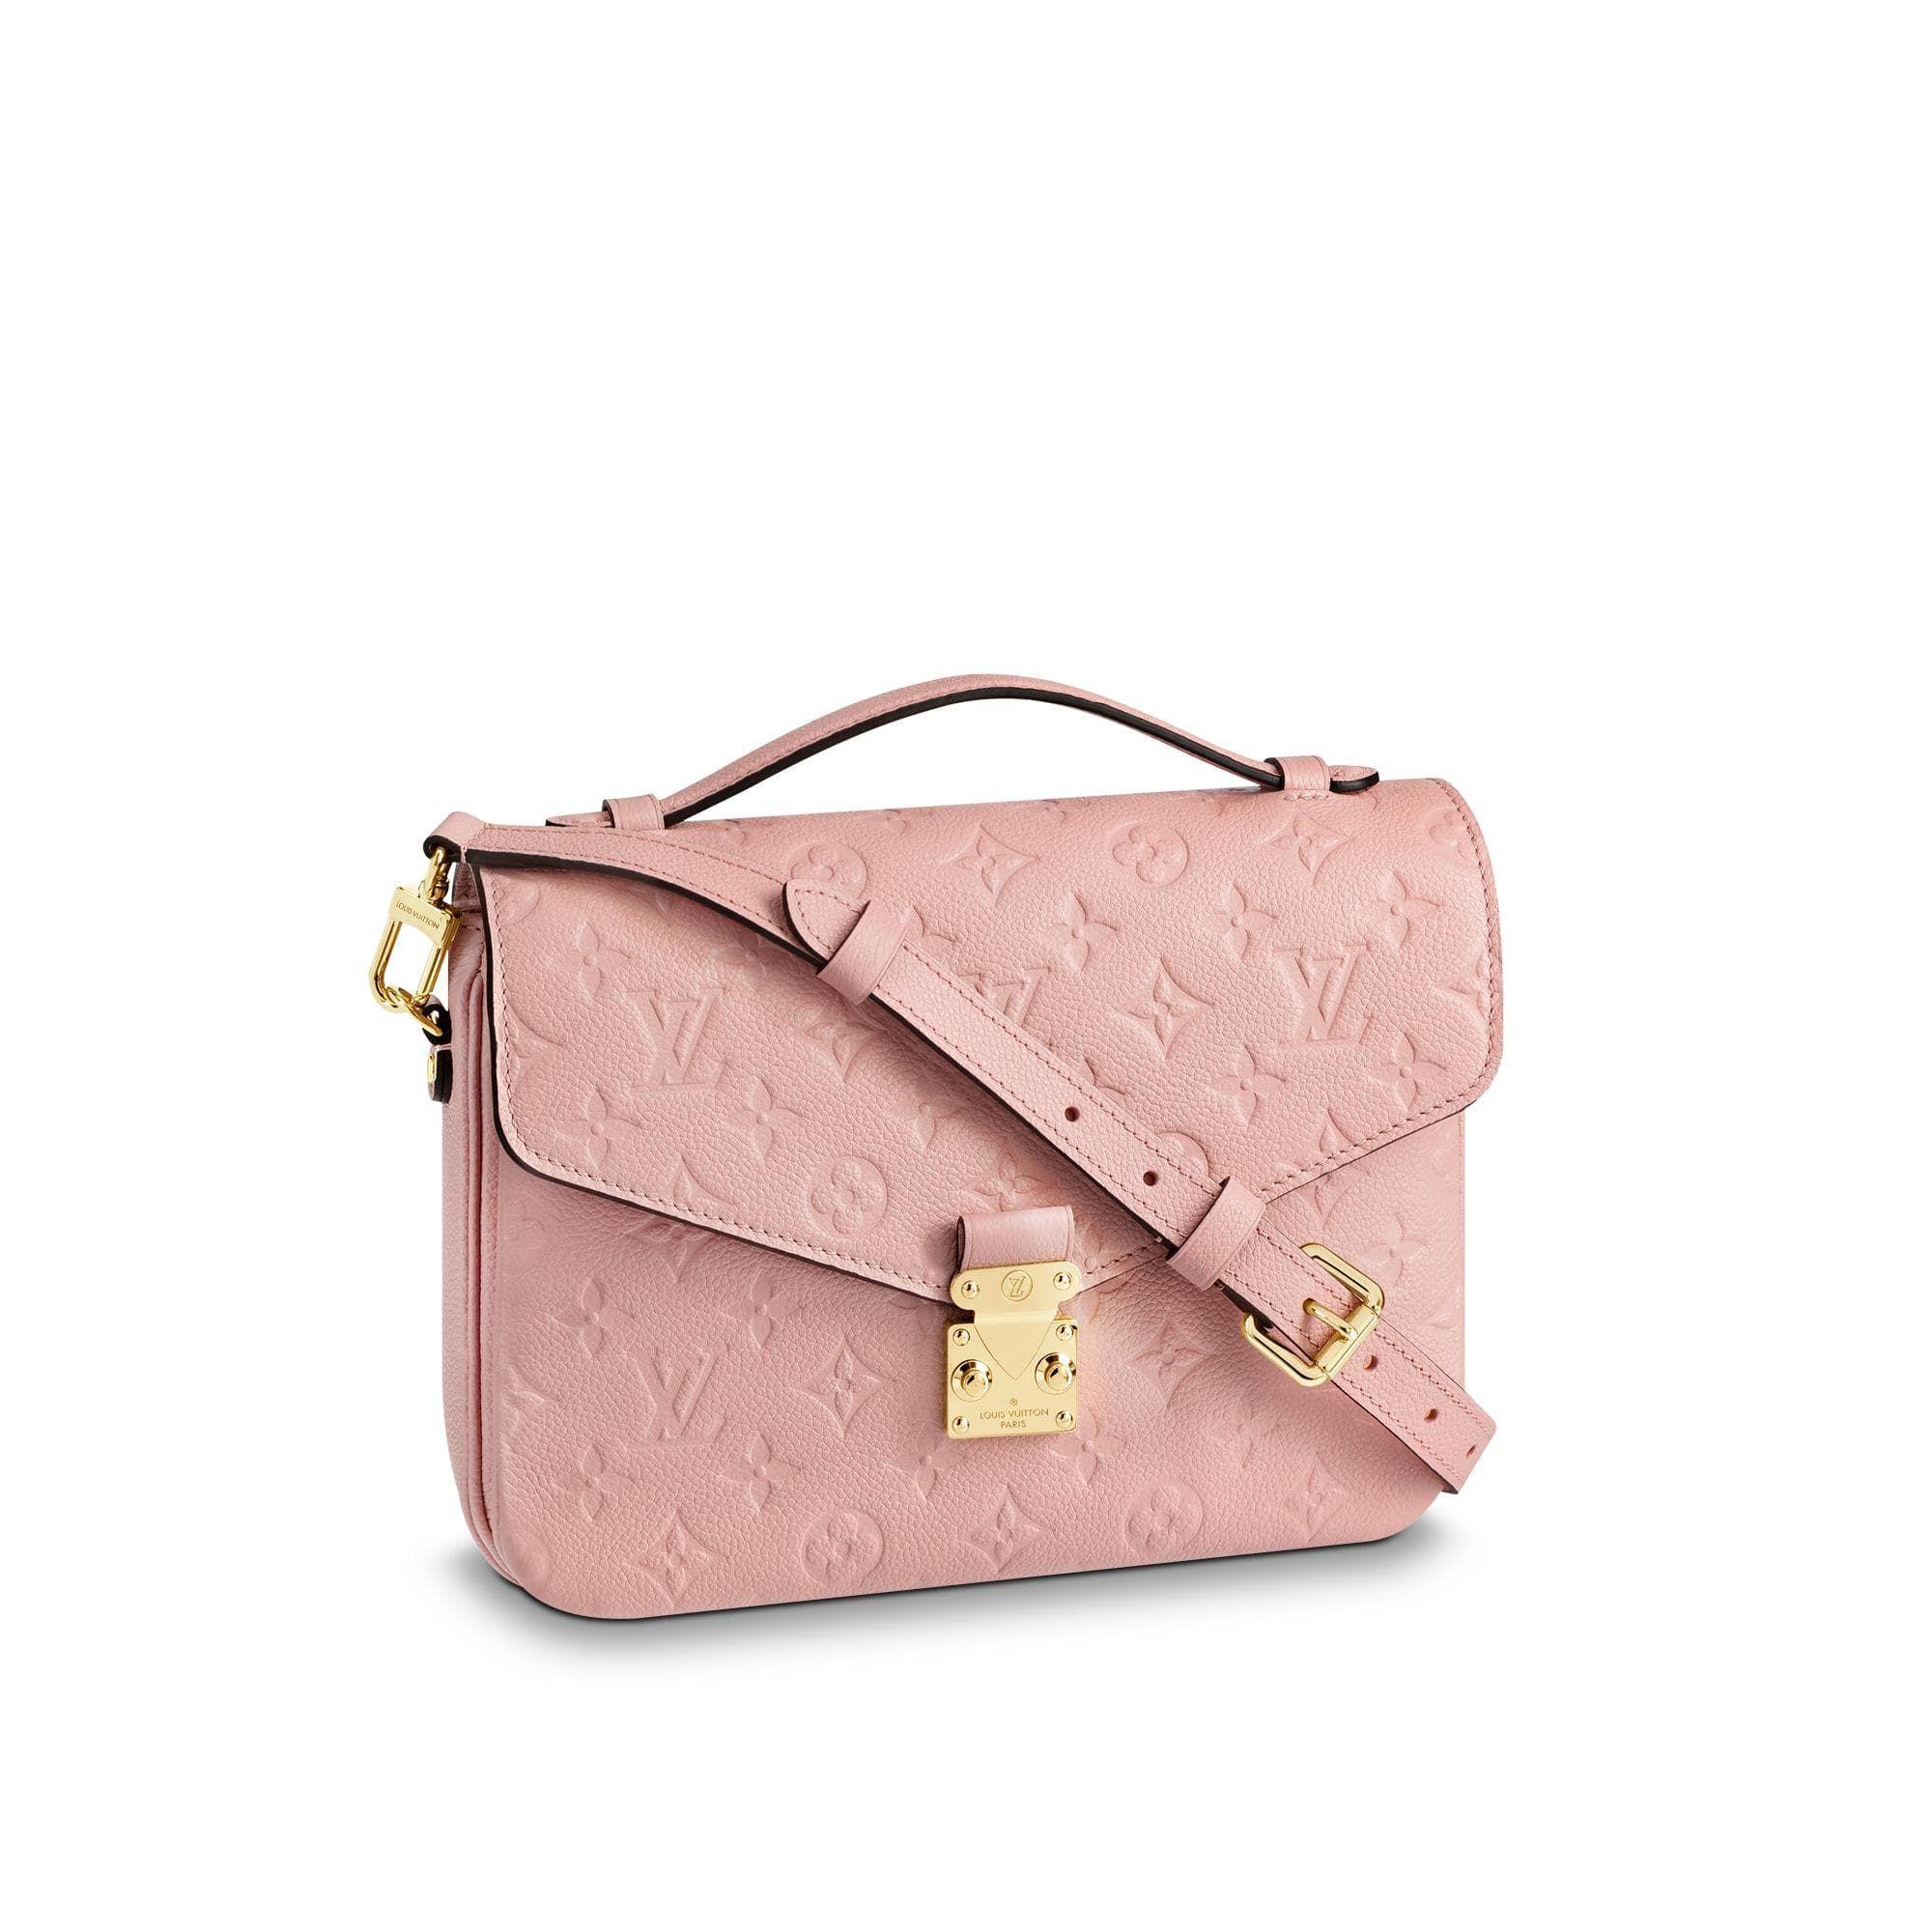 583aee989c Pochette Metis in 2019 | BAGS | Louis vuitton handbags, Louis ...